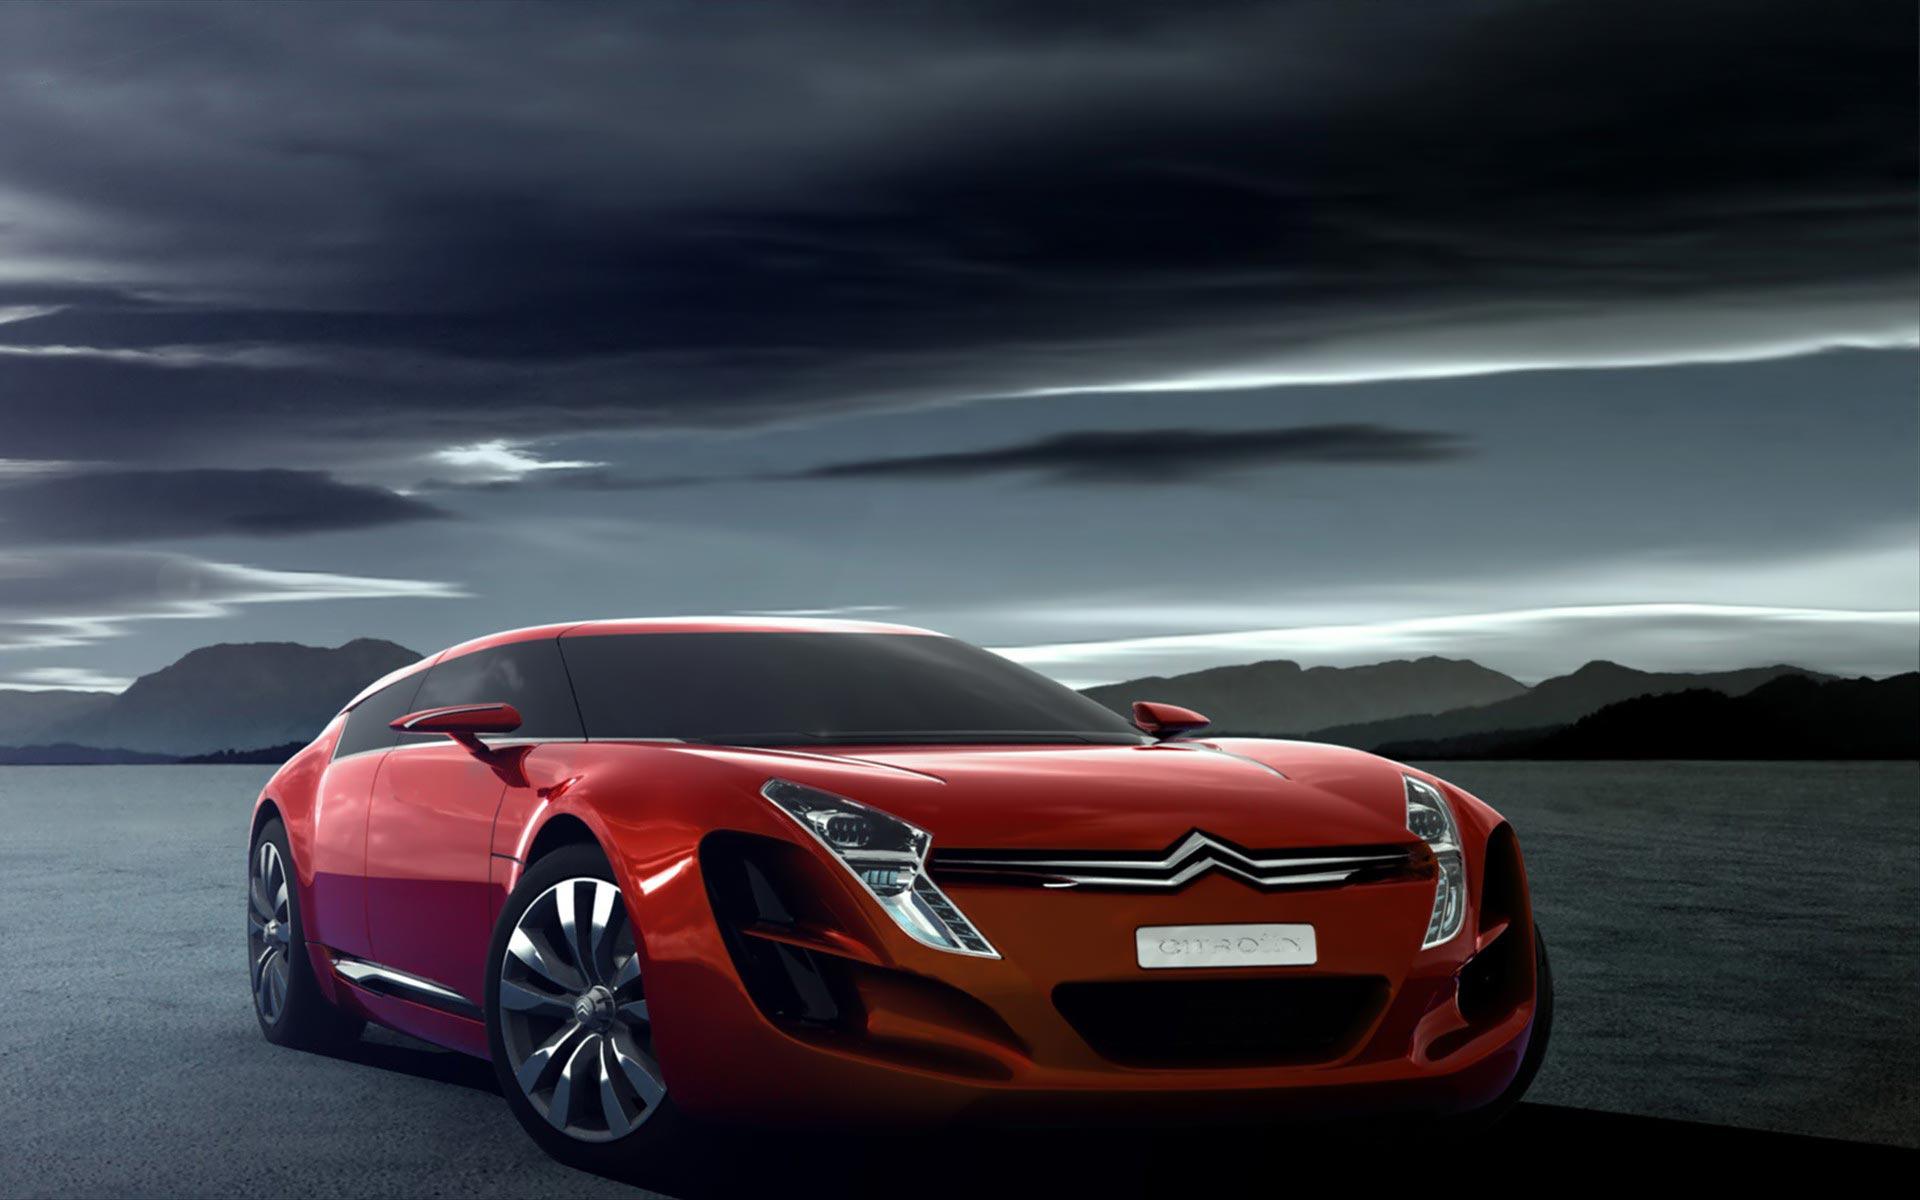 Desktop Wallpaper · Motors · Cars Citroen Metisse